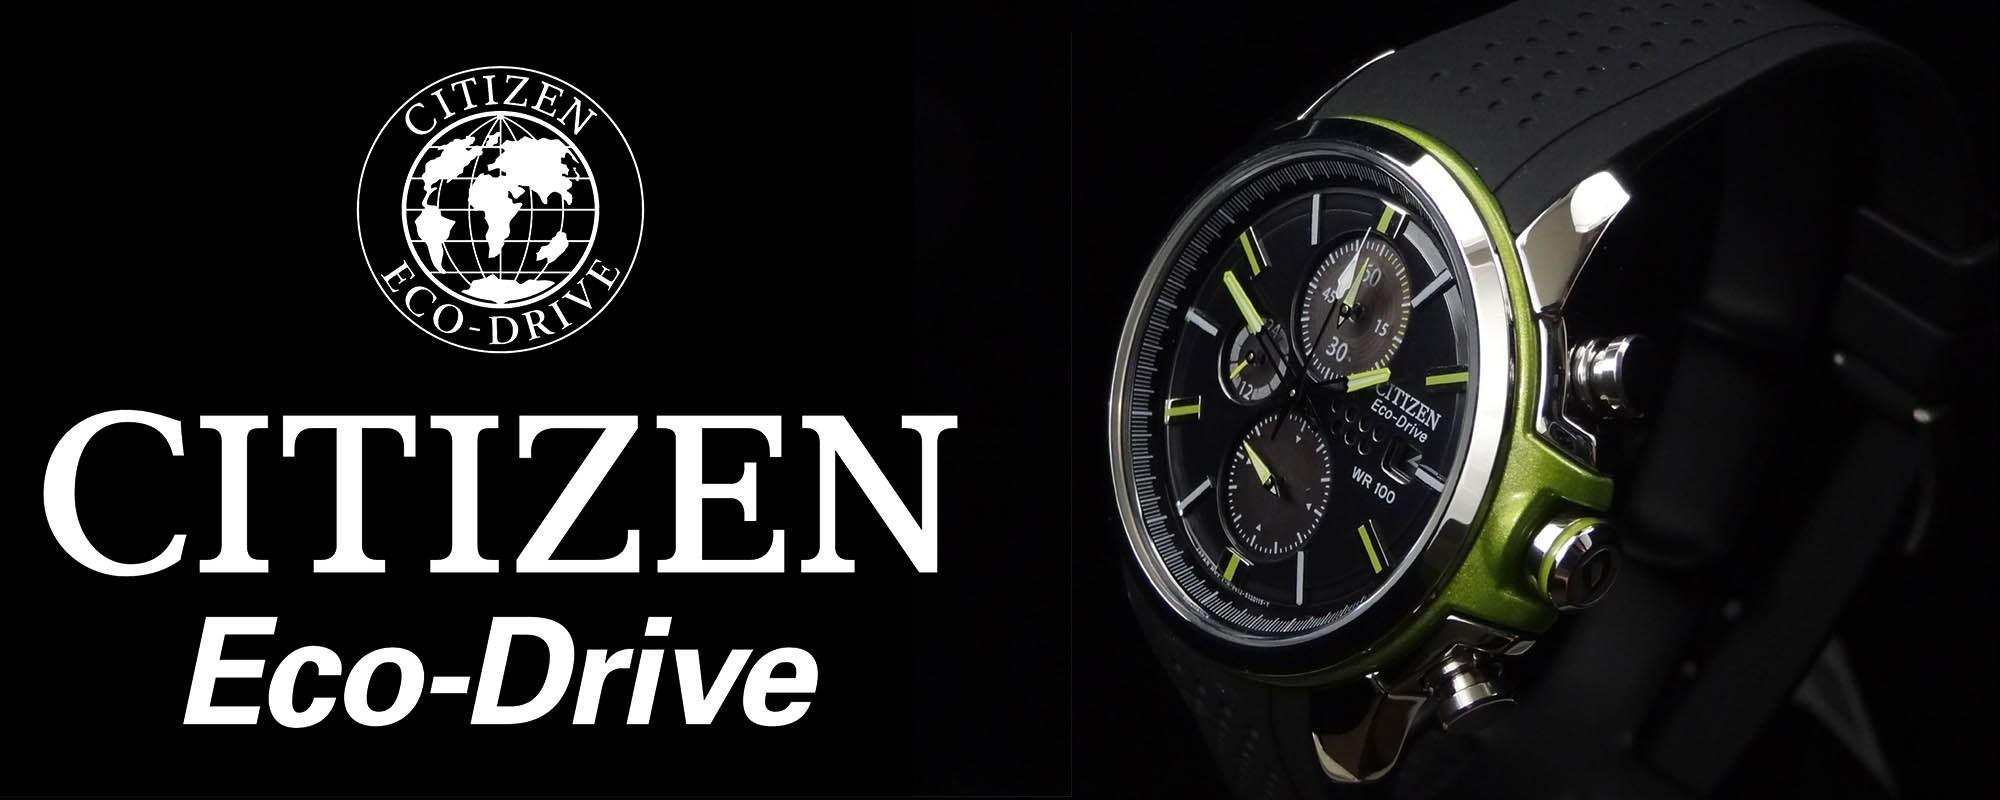 Citizen EcoDrive watch banner